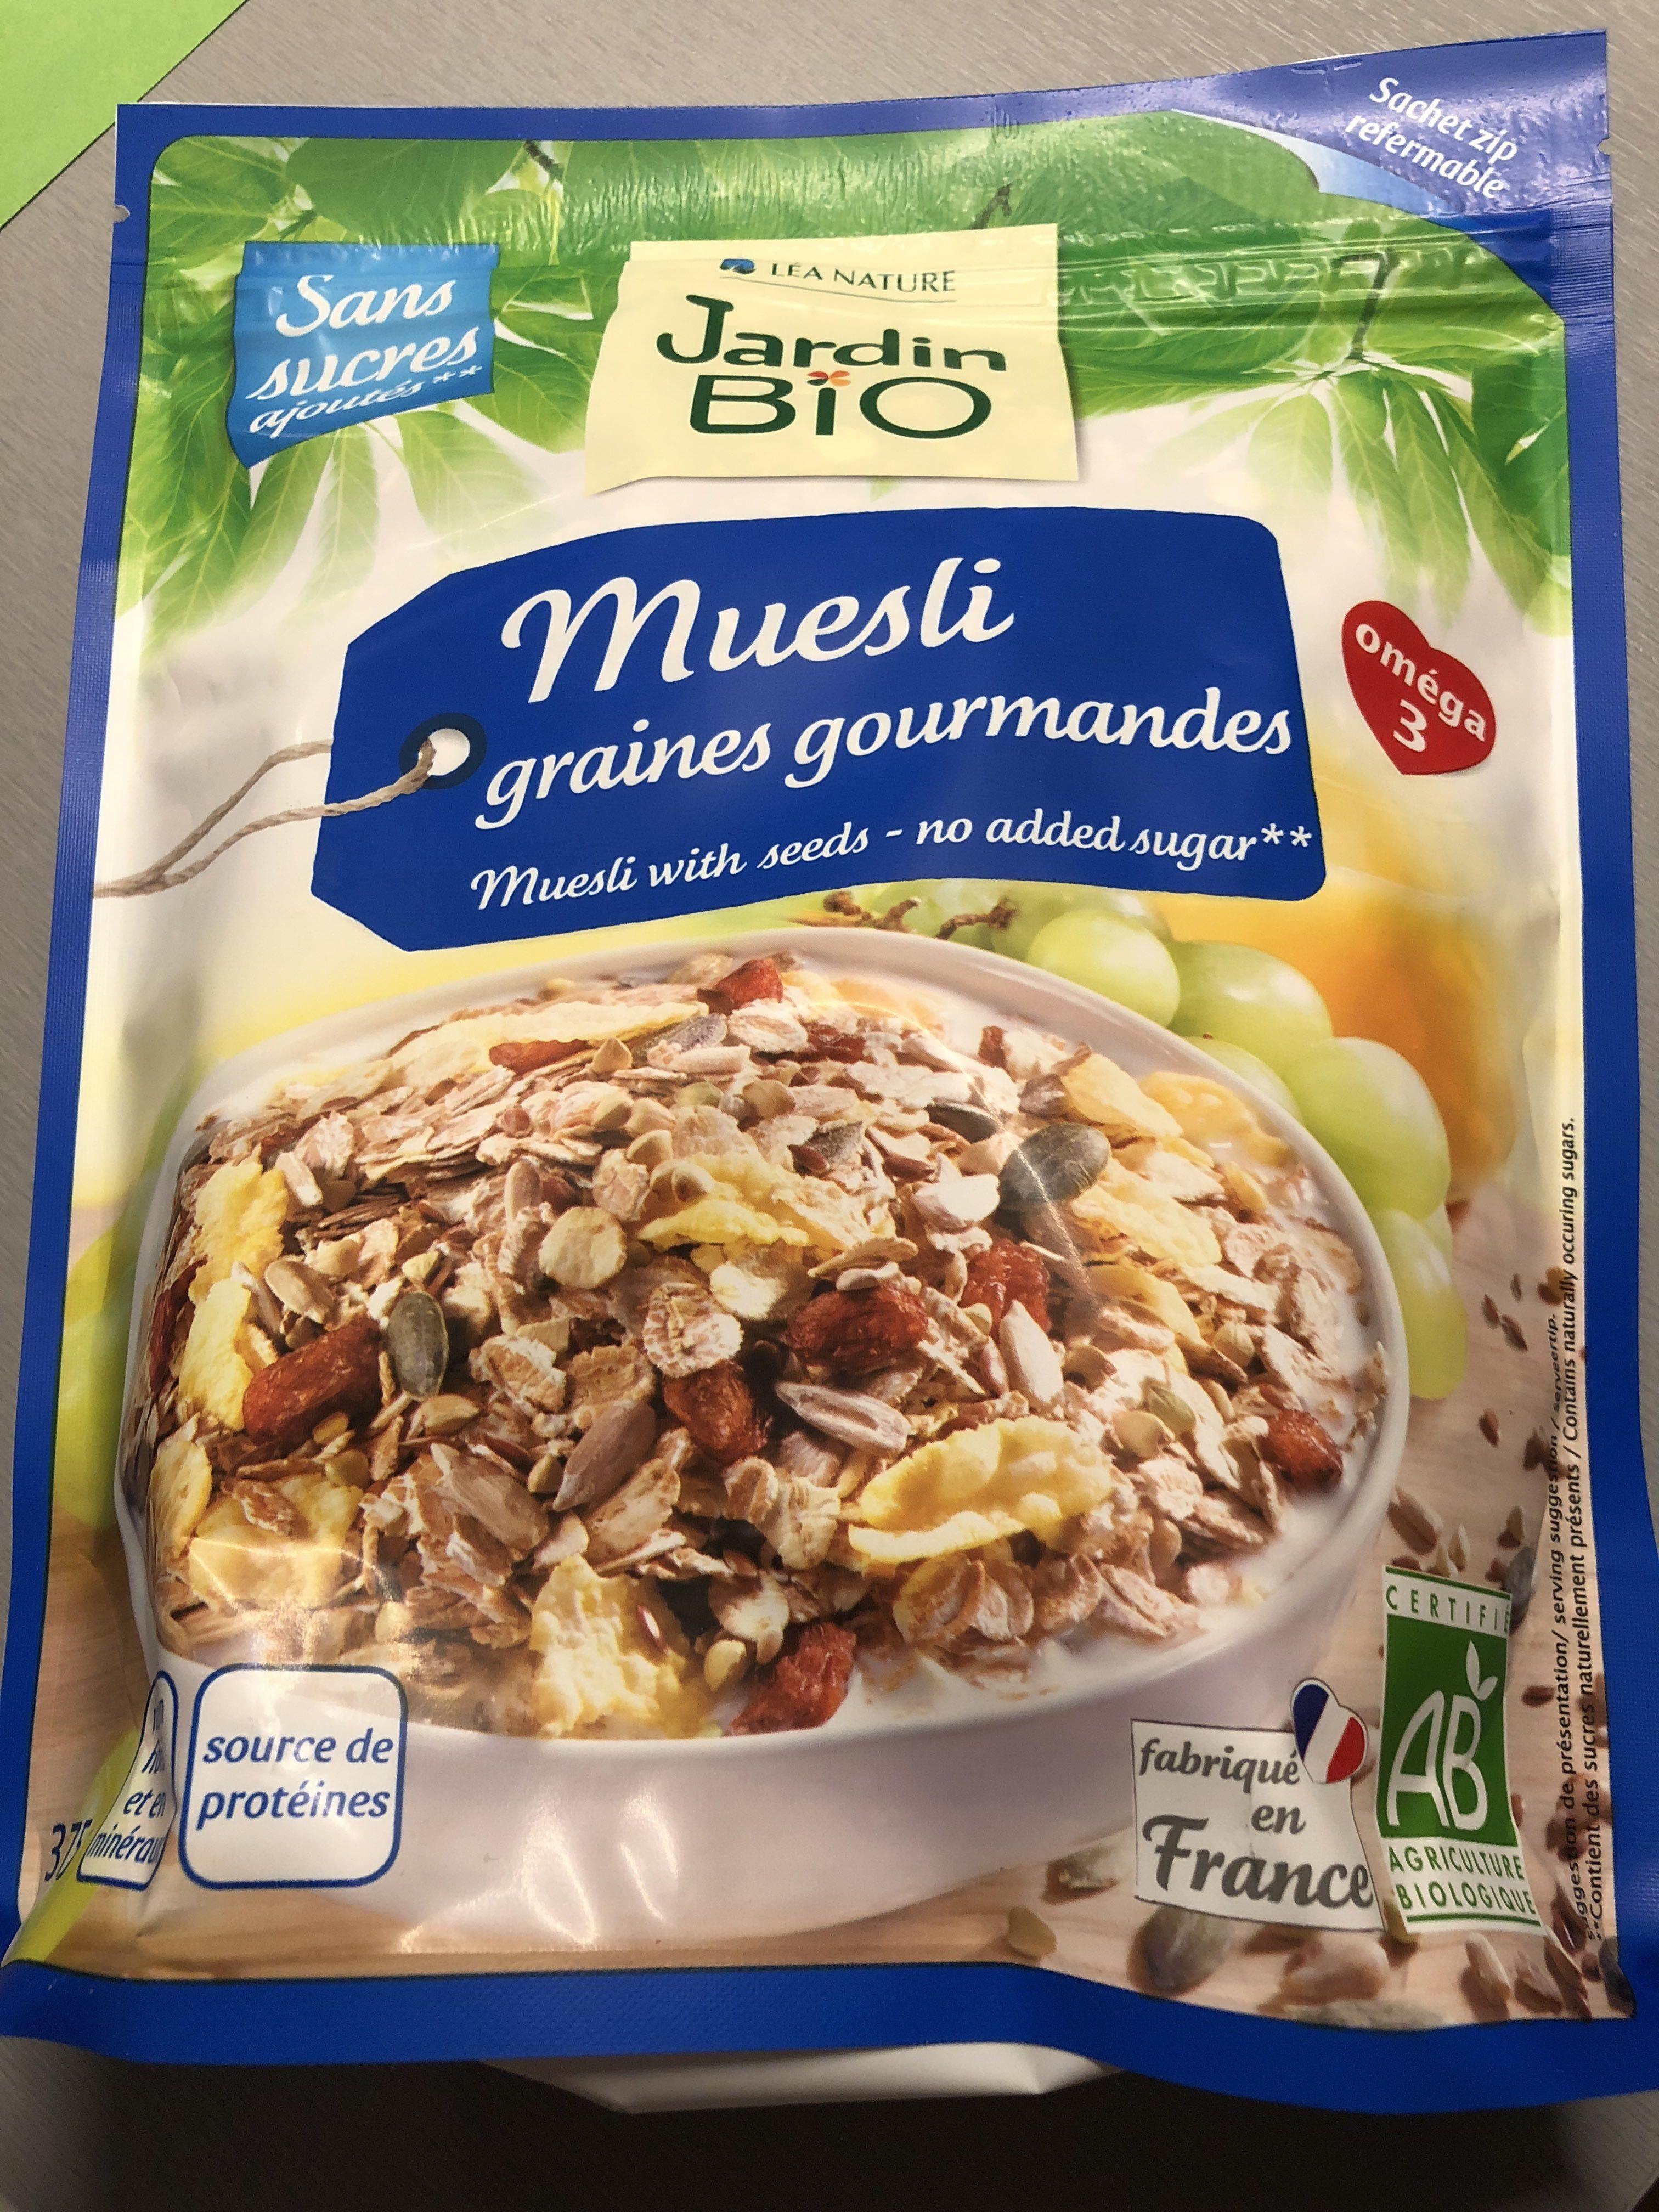 Müesli graines gourmandes - Product - fr